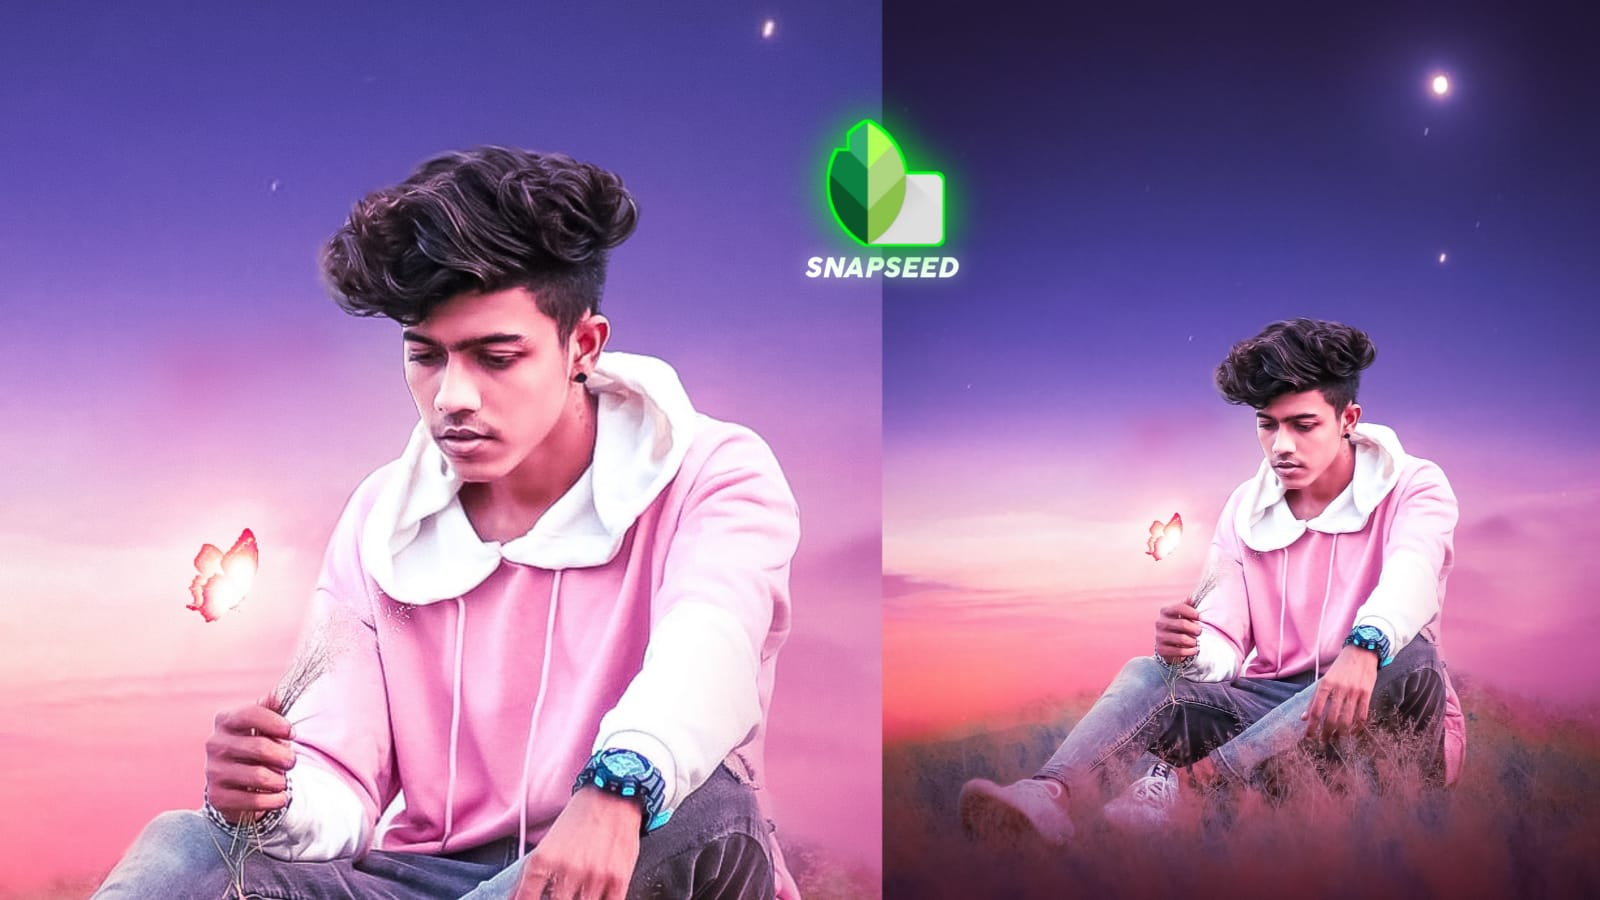 Snapseed Background change